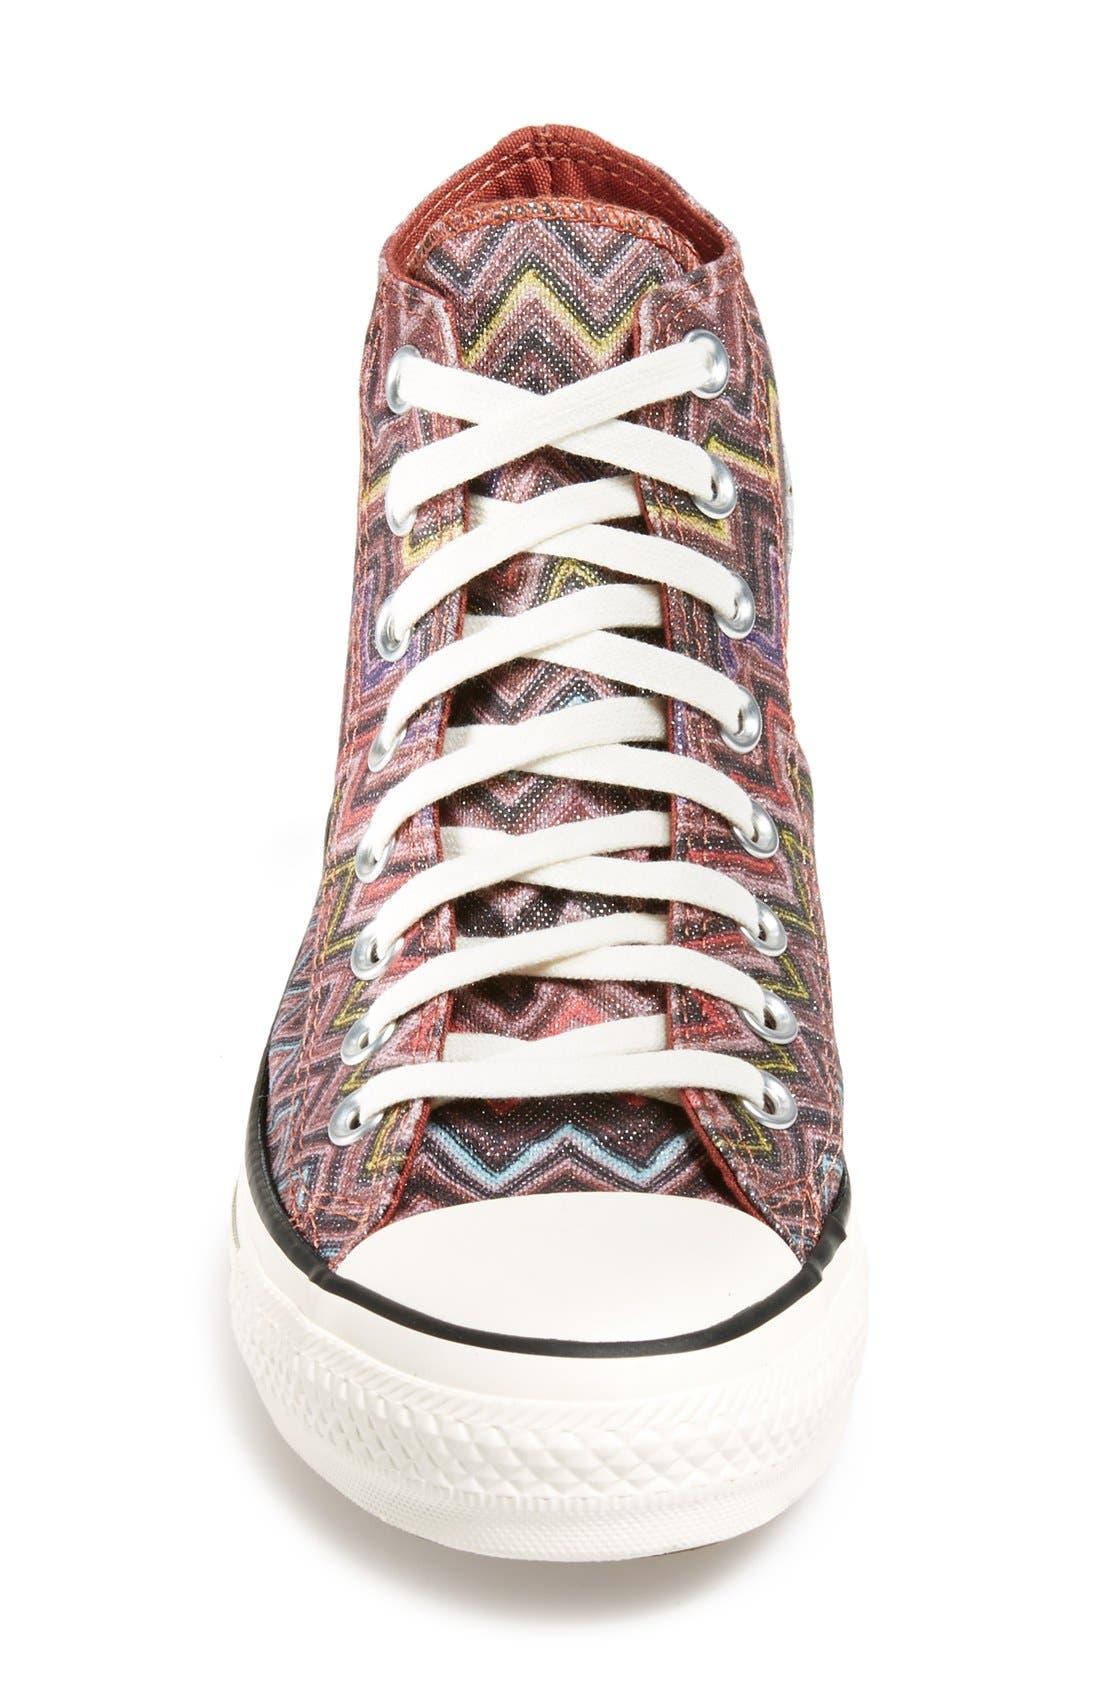 Alternate Image 3  - Converse x Missoni Chuck Taylor® All Star® High Top Sneaker (Women)